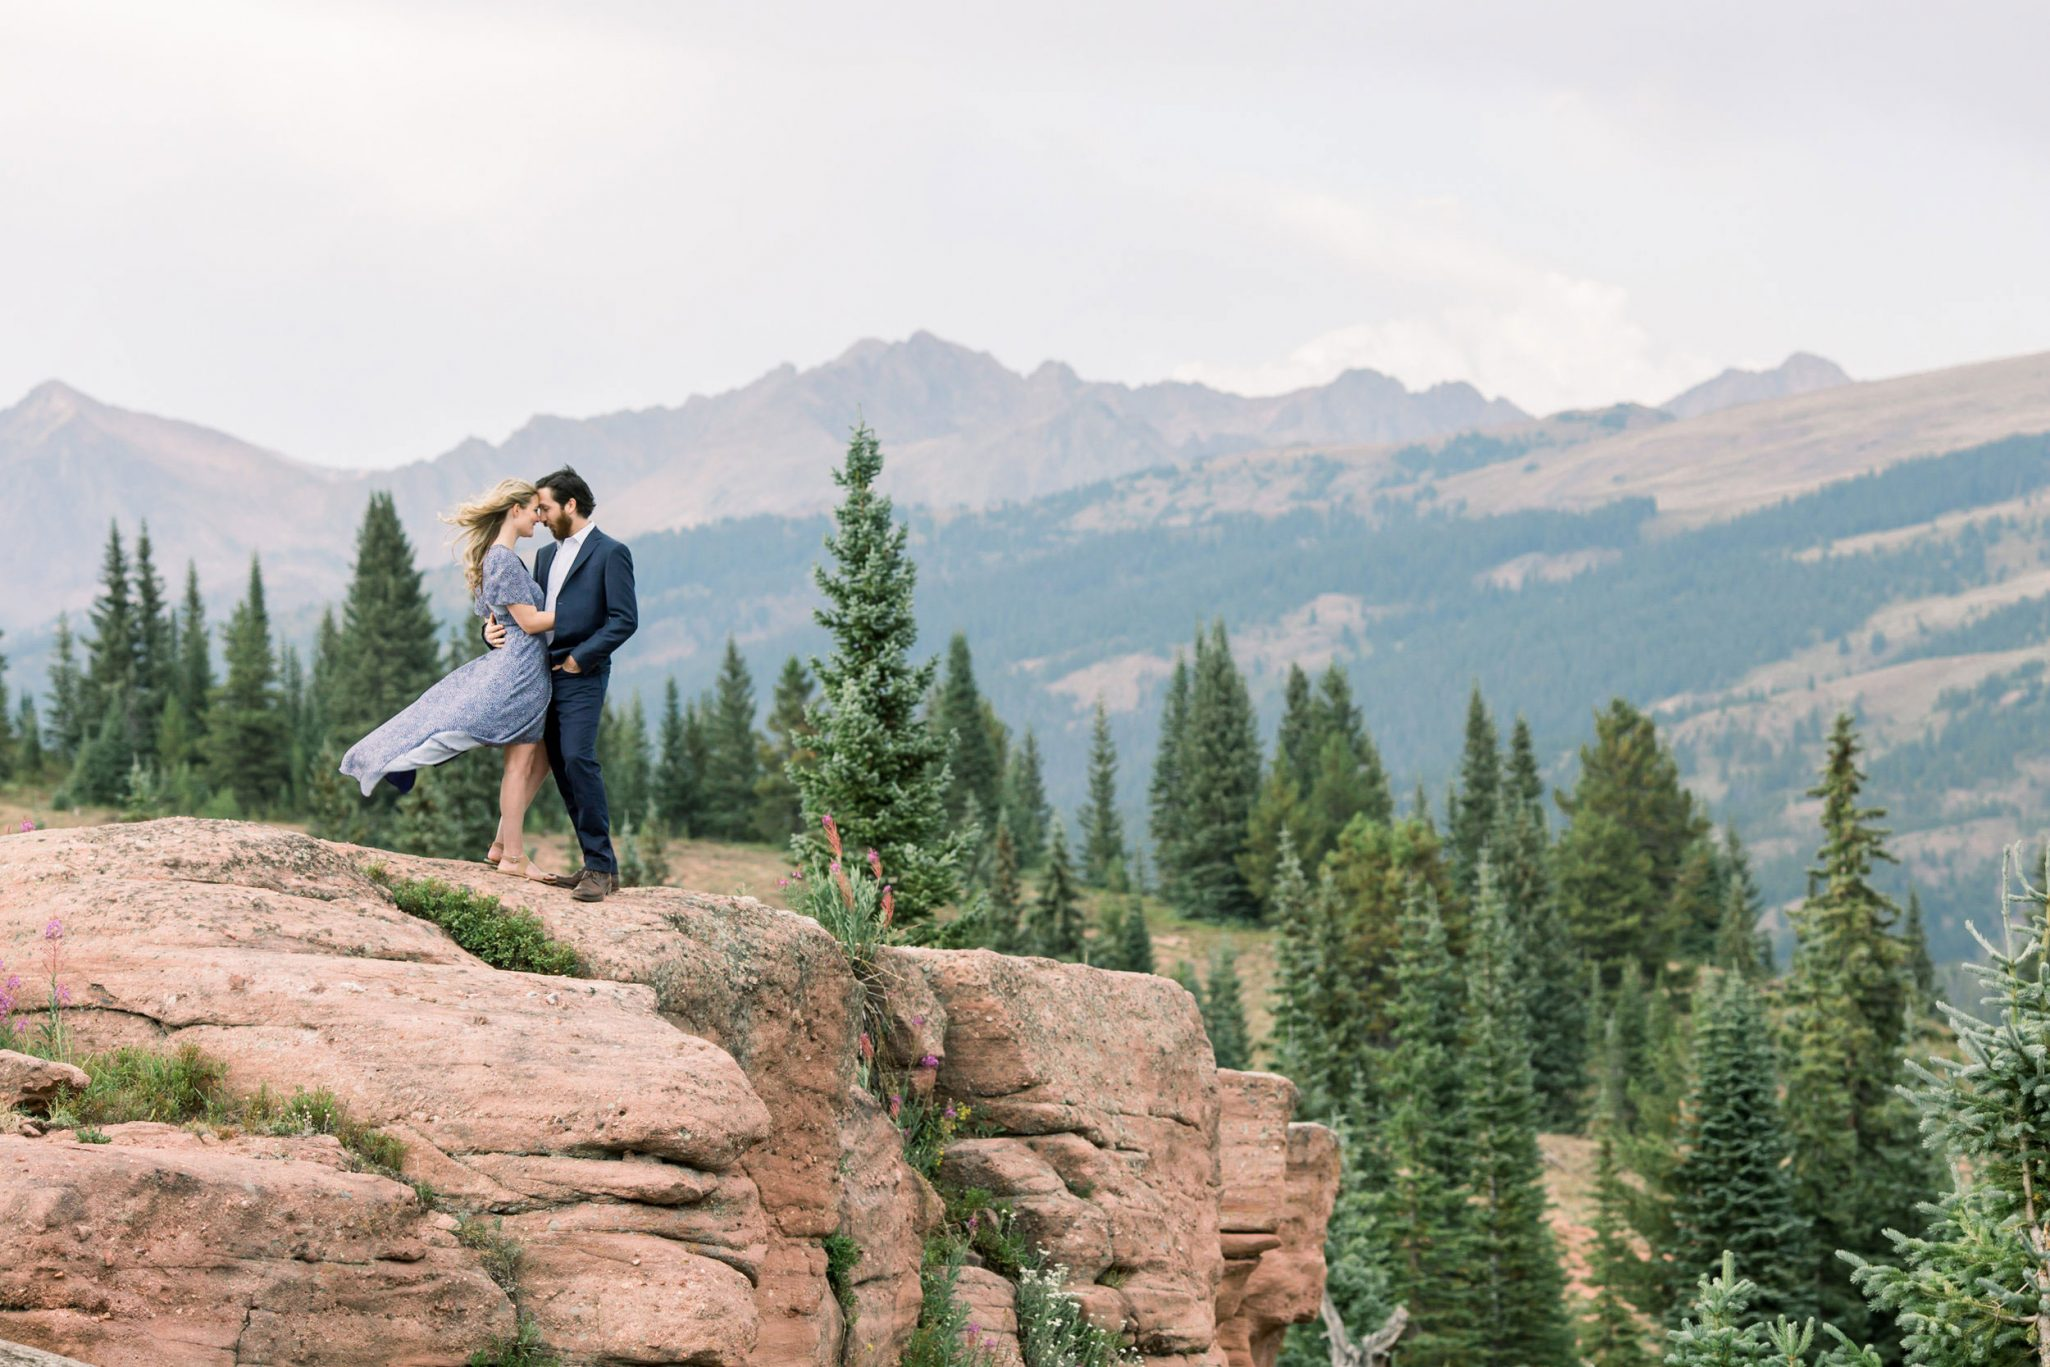 Engagement photos on Shrine Mountain, Vail, Colorado